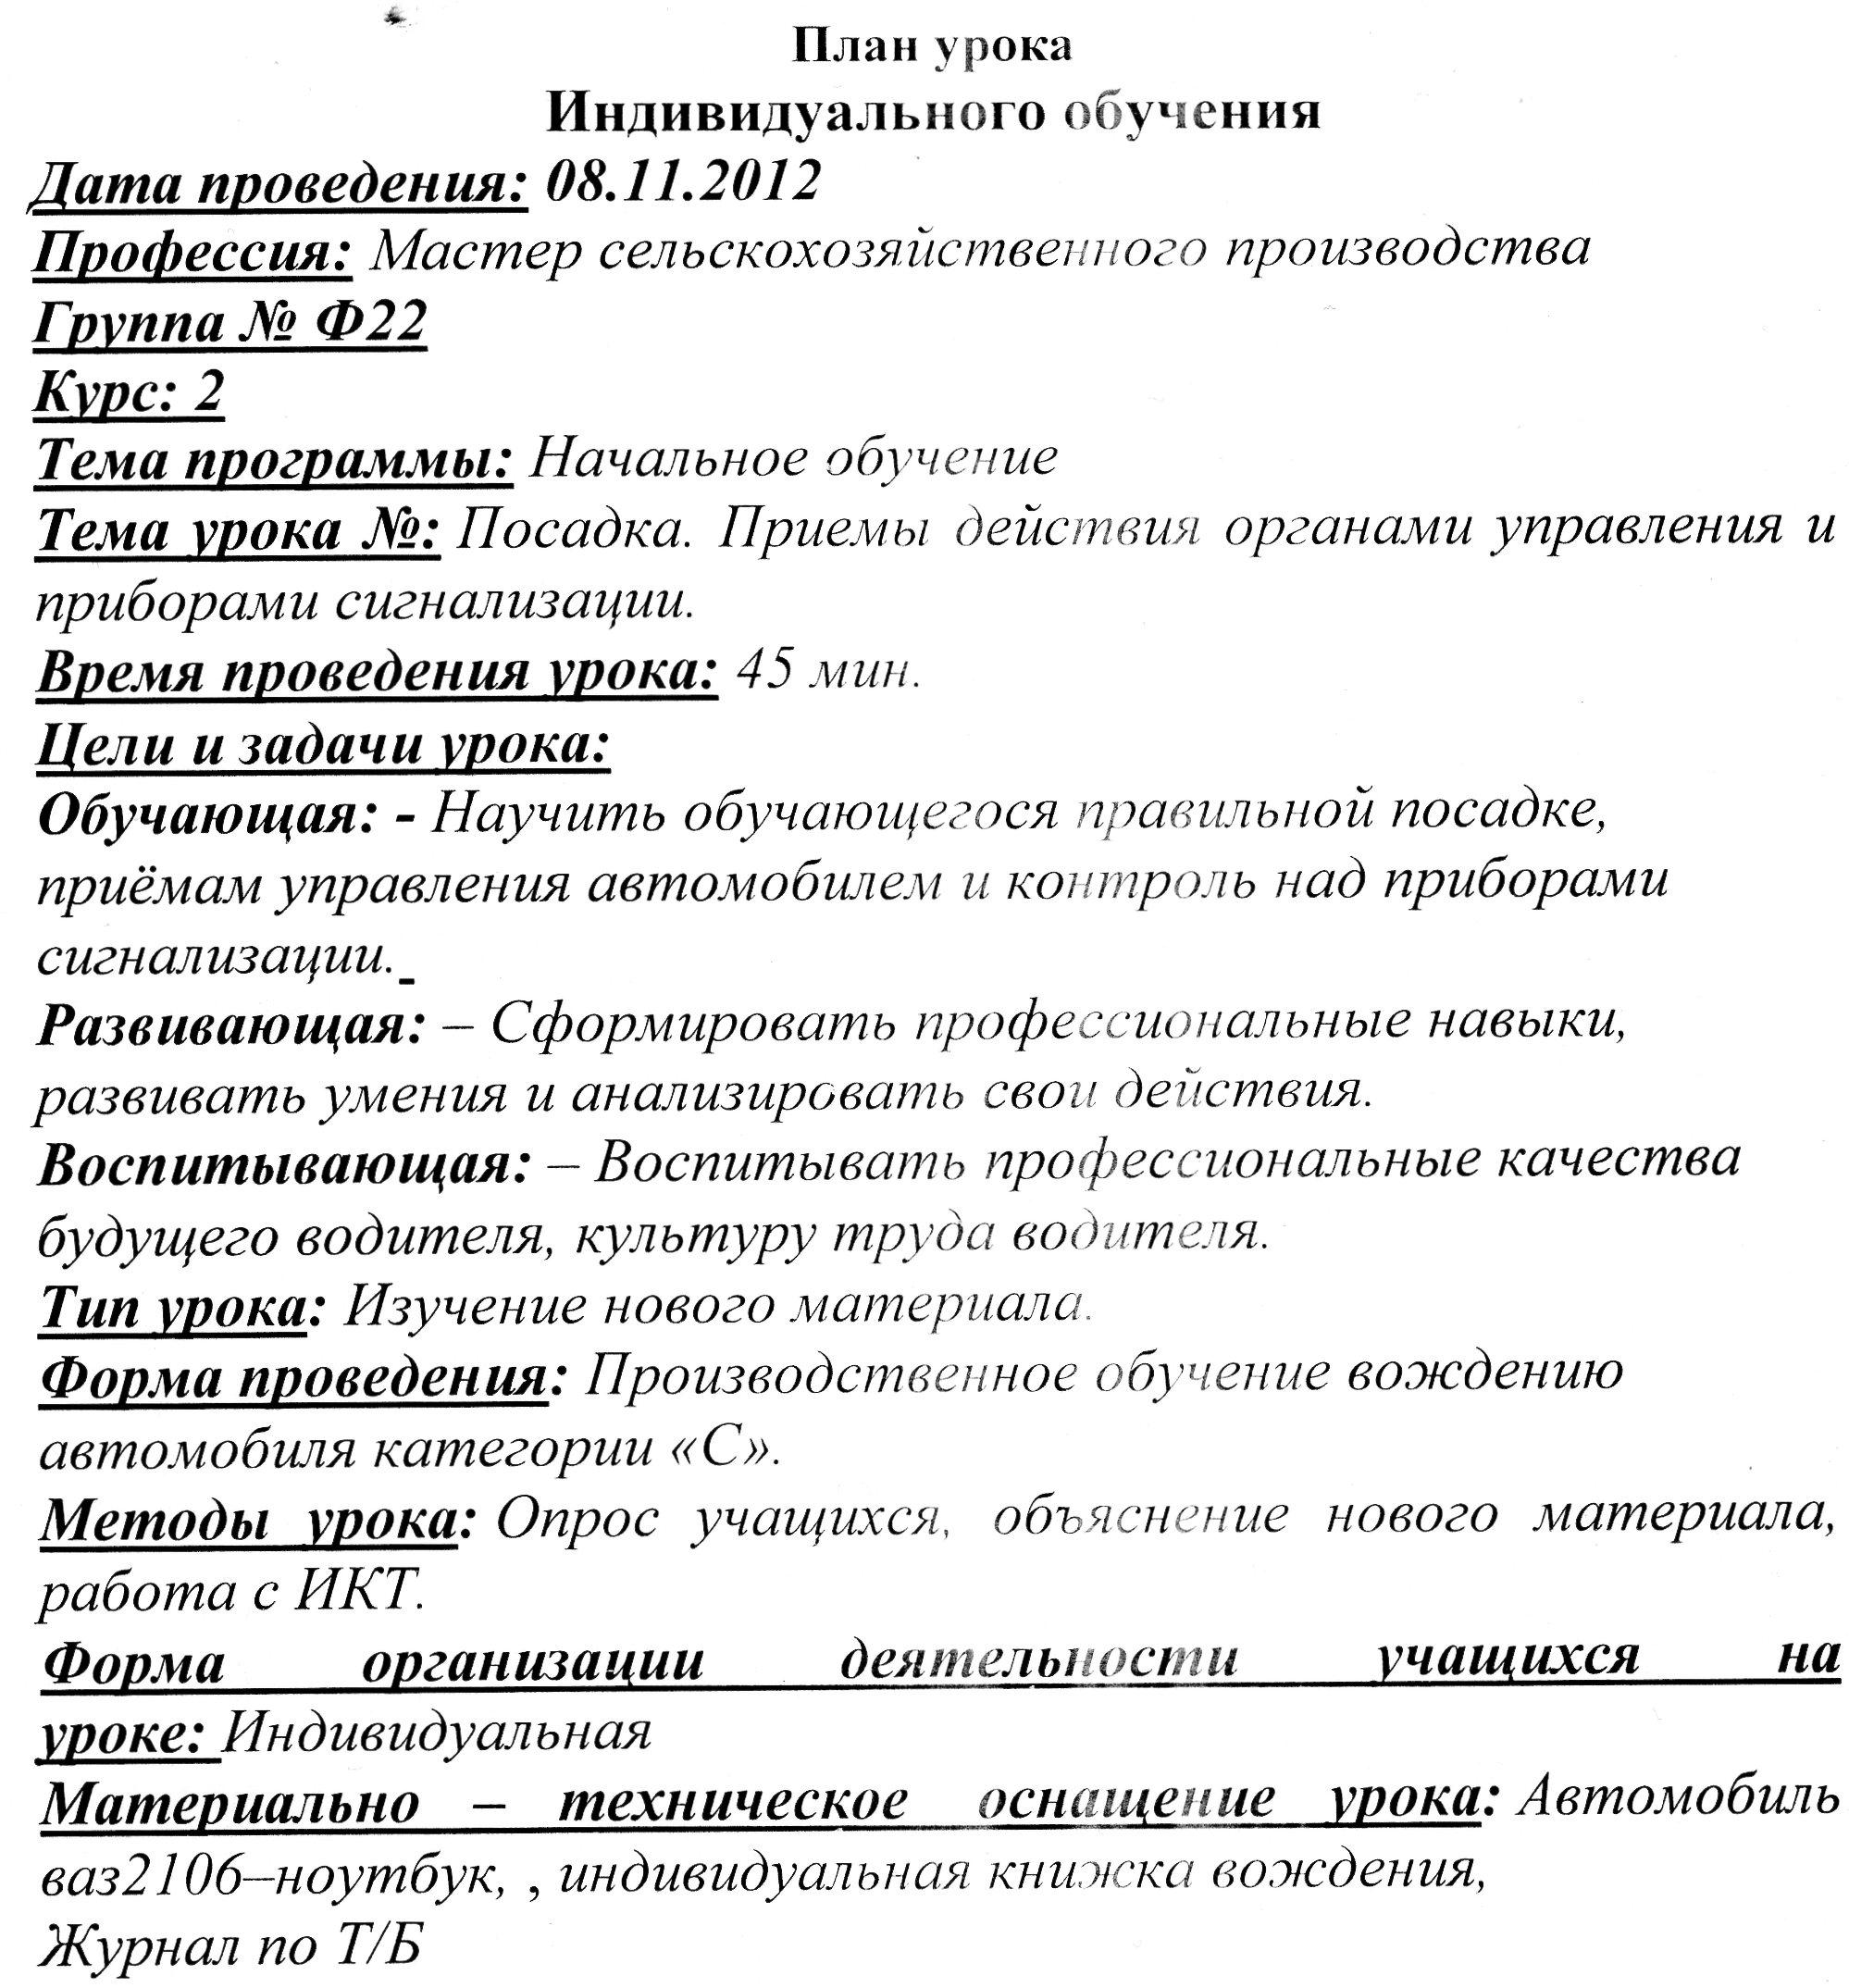 C:\Users\Василий Мельченко\Pictures\img622.jpg